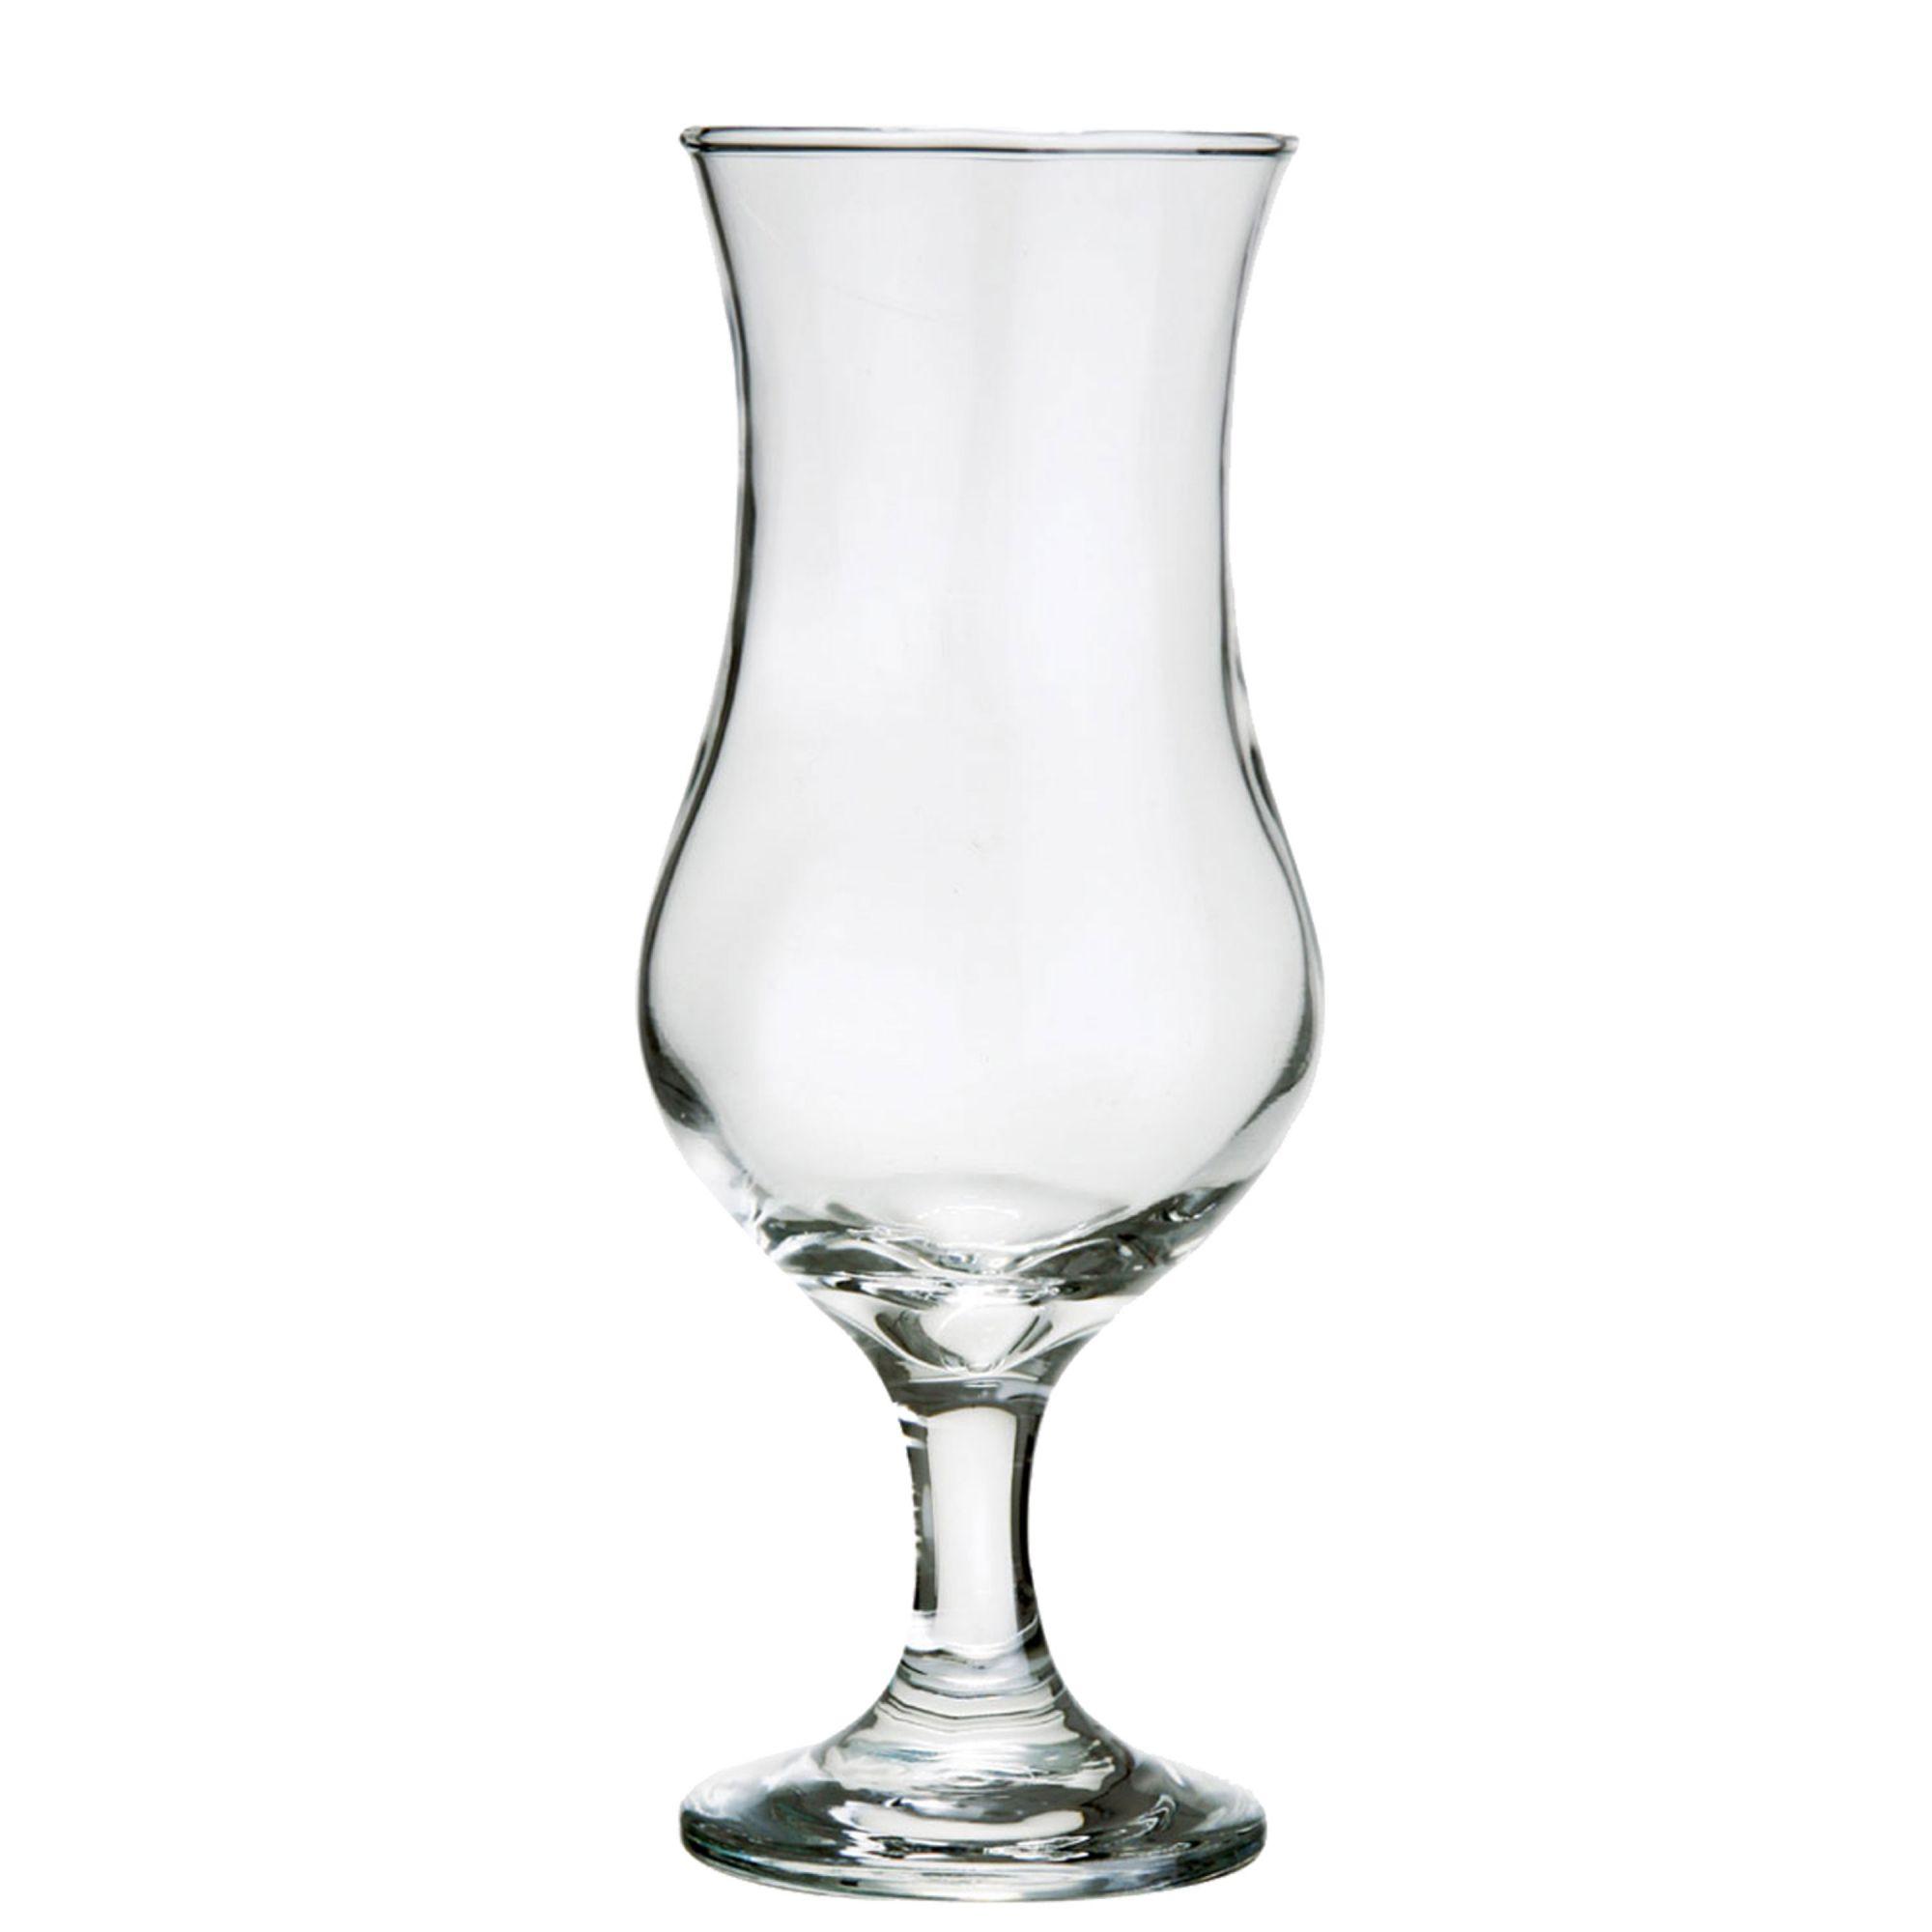 Jogo de Taça de Cocktail Vidro 380ml 4 Pcs